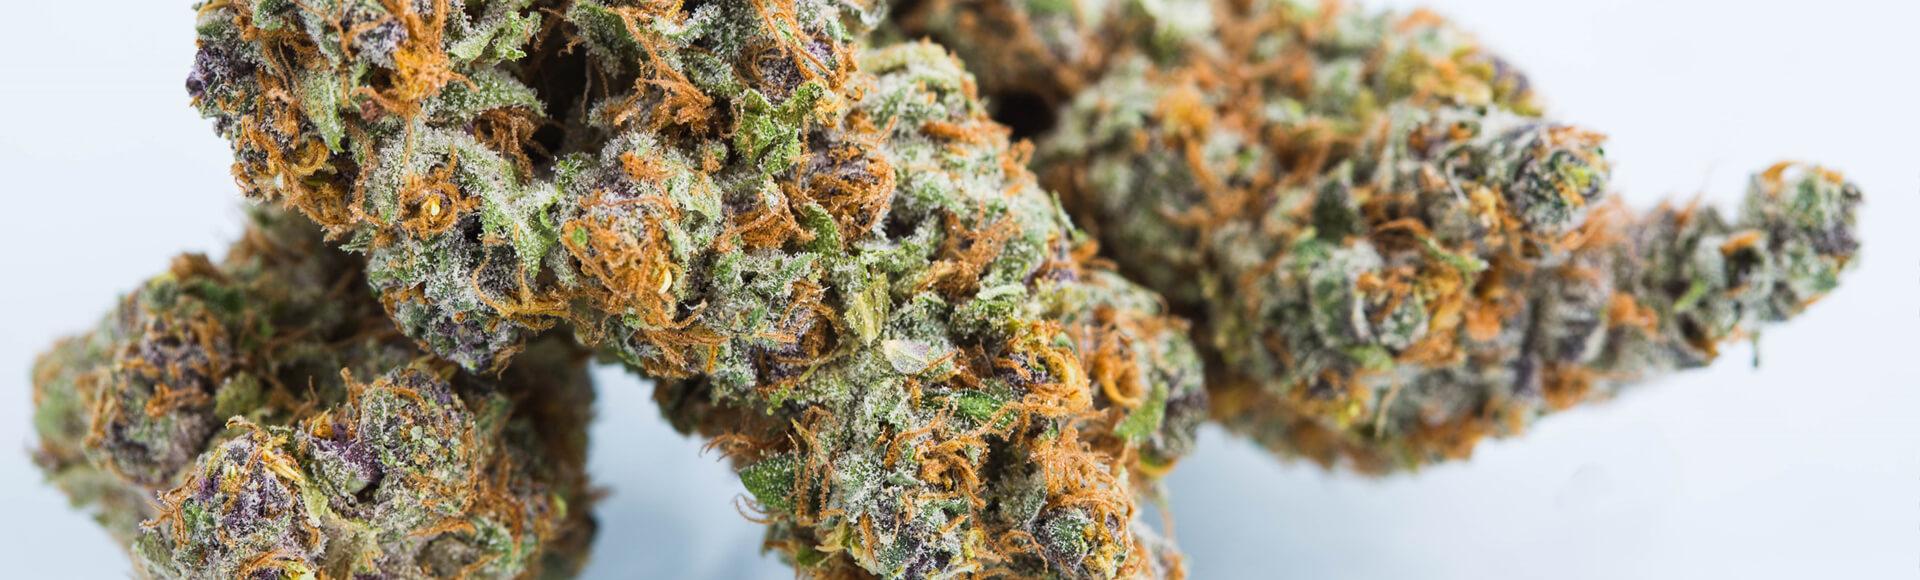 Many strains of Cannabis. Choose high CBD or high THC RSO.